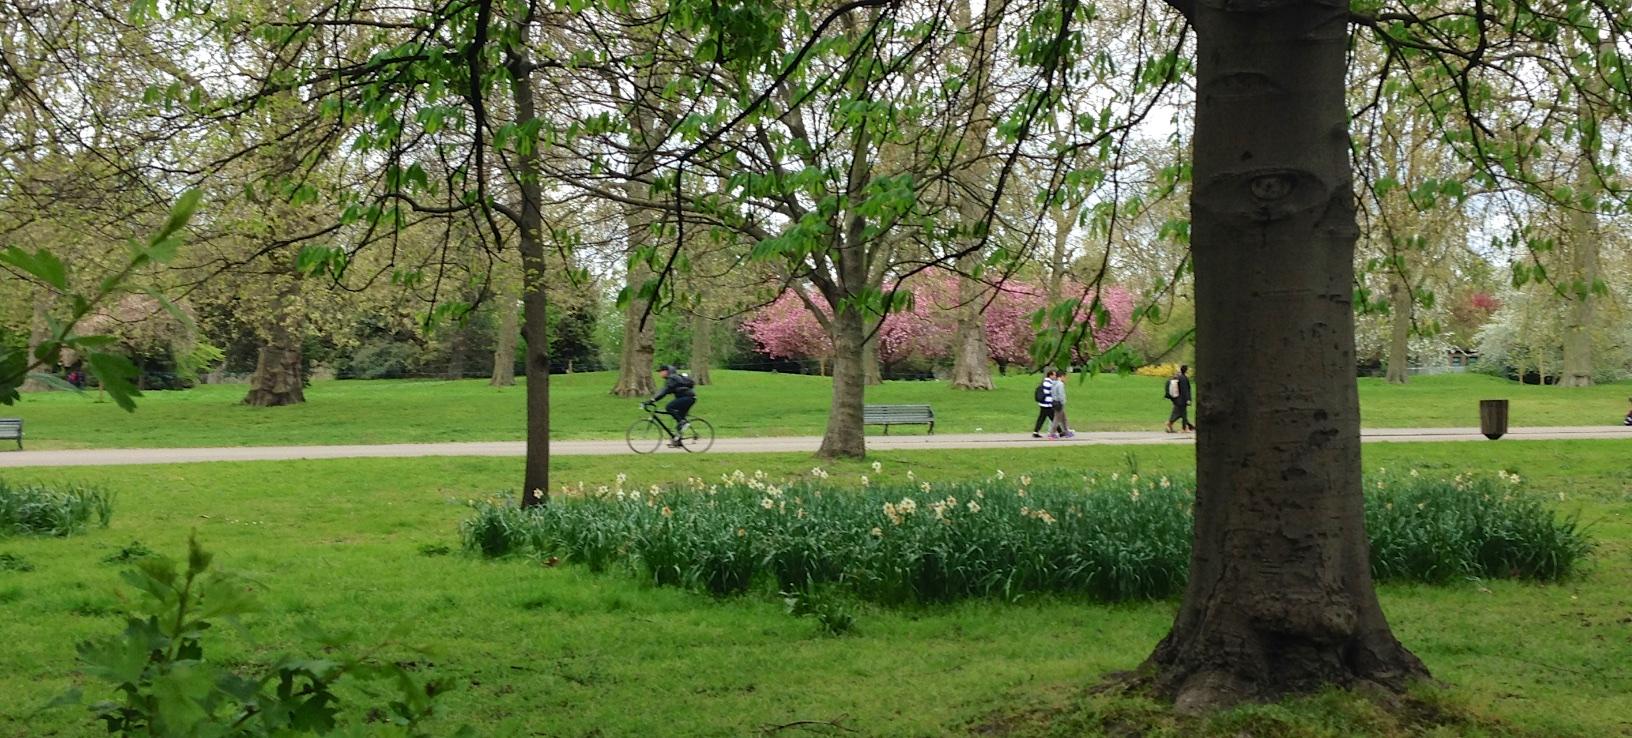 An odd-bod's take on a week in London – April 2015